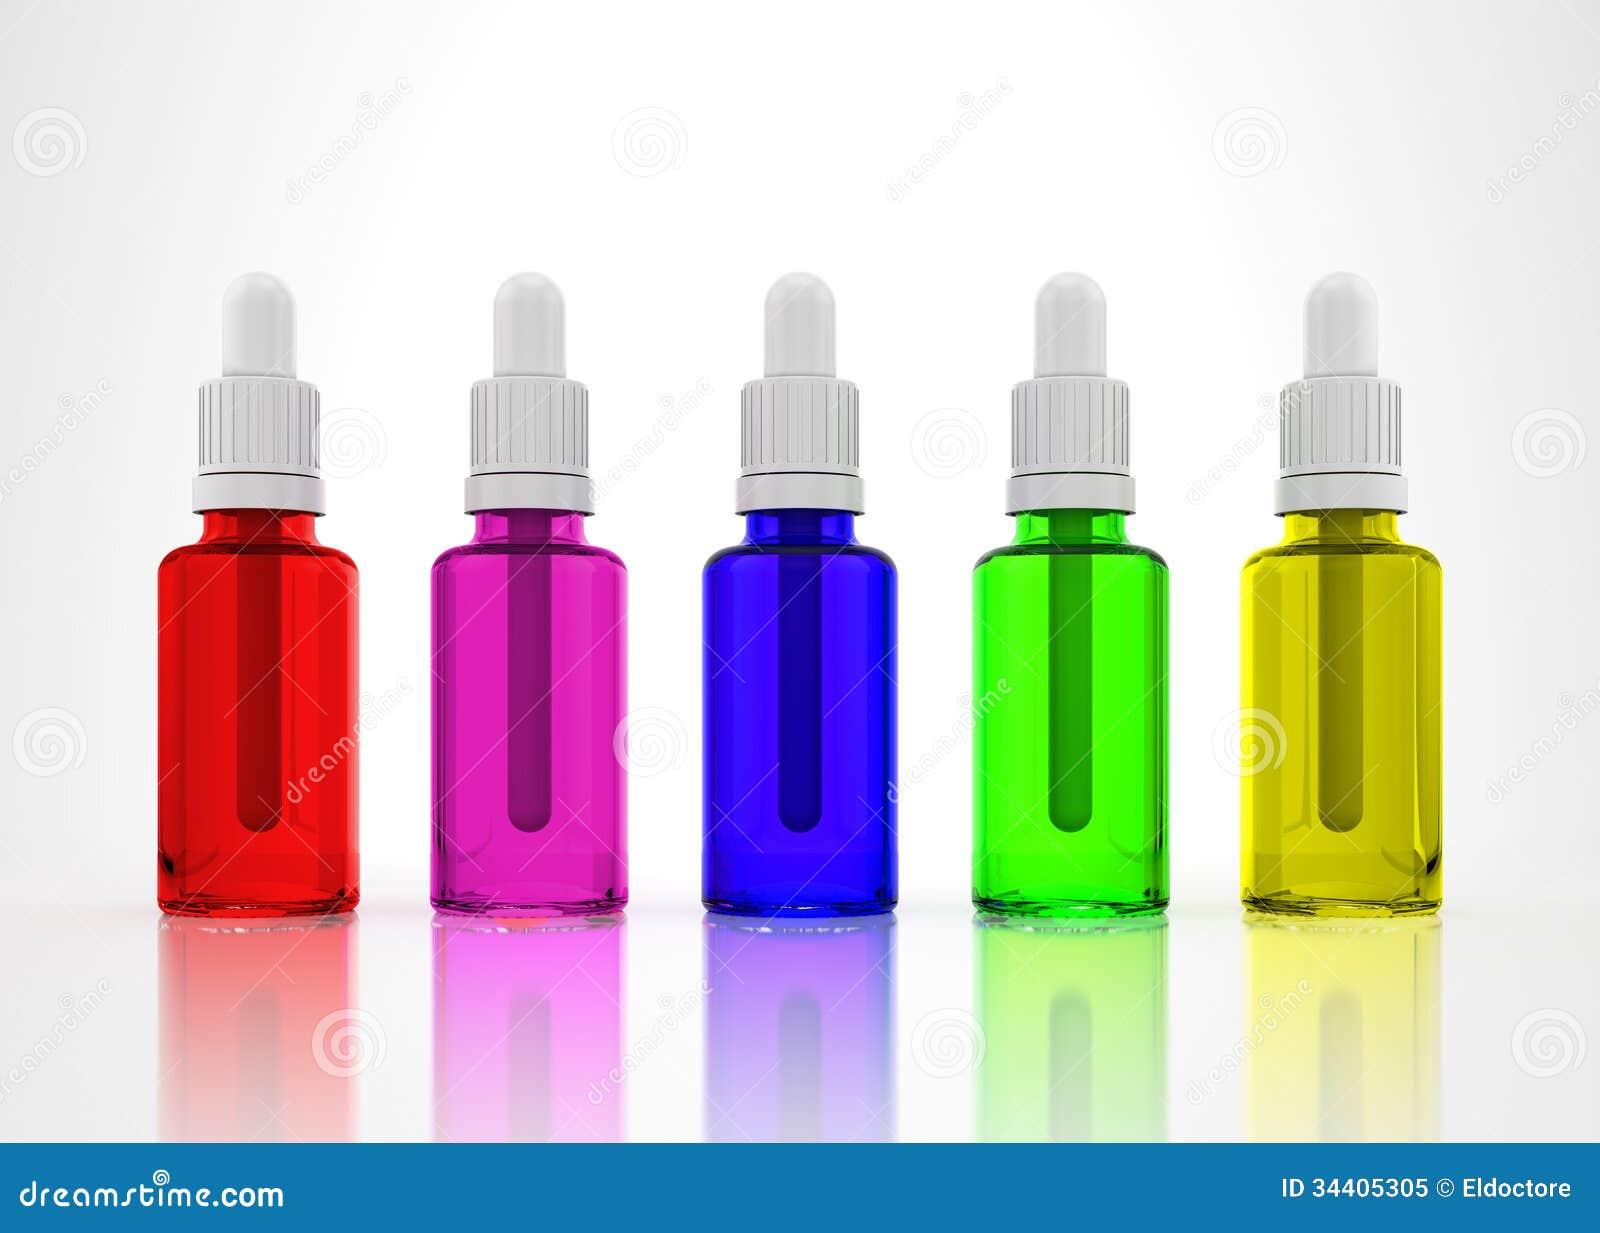 Eye Dropper Bottles Isolated Royalty Free Stock Photo